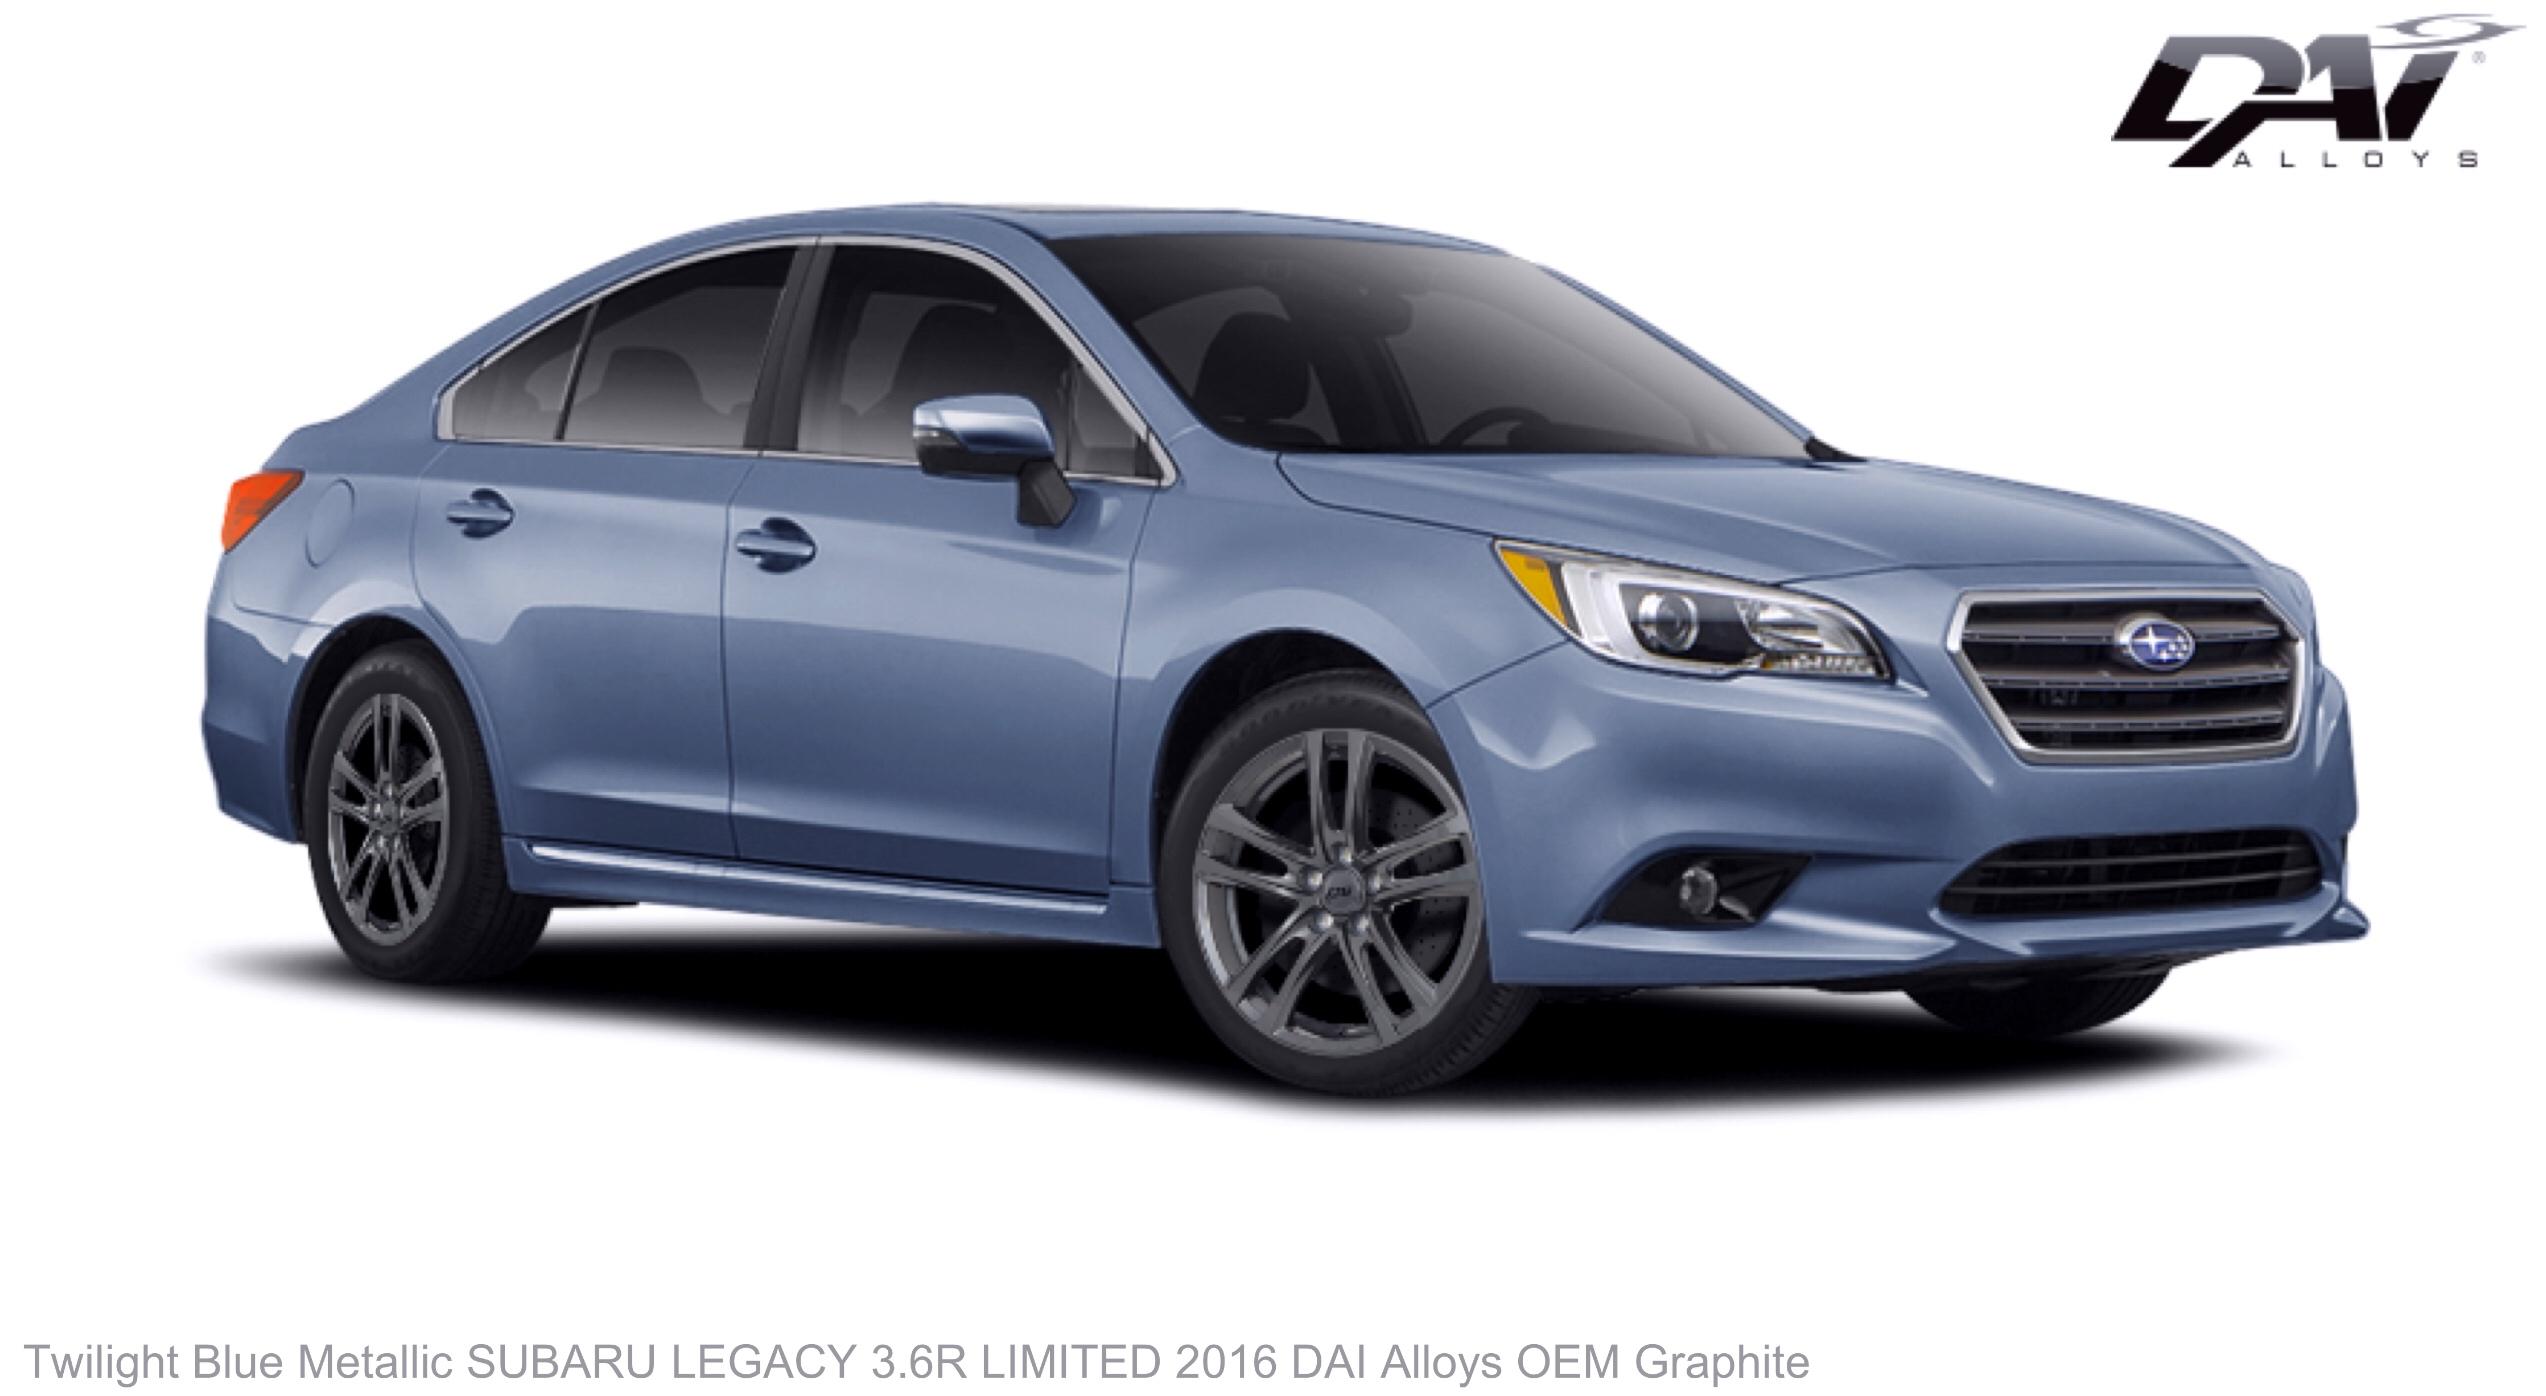 Subaru Legacy V Restyling 2012 - 2014 Station wagon 5 door #4